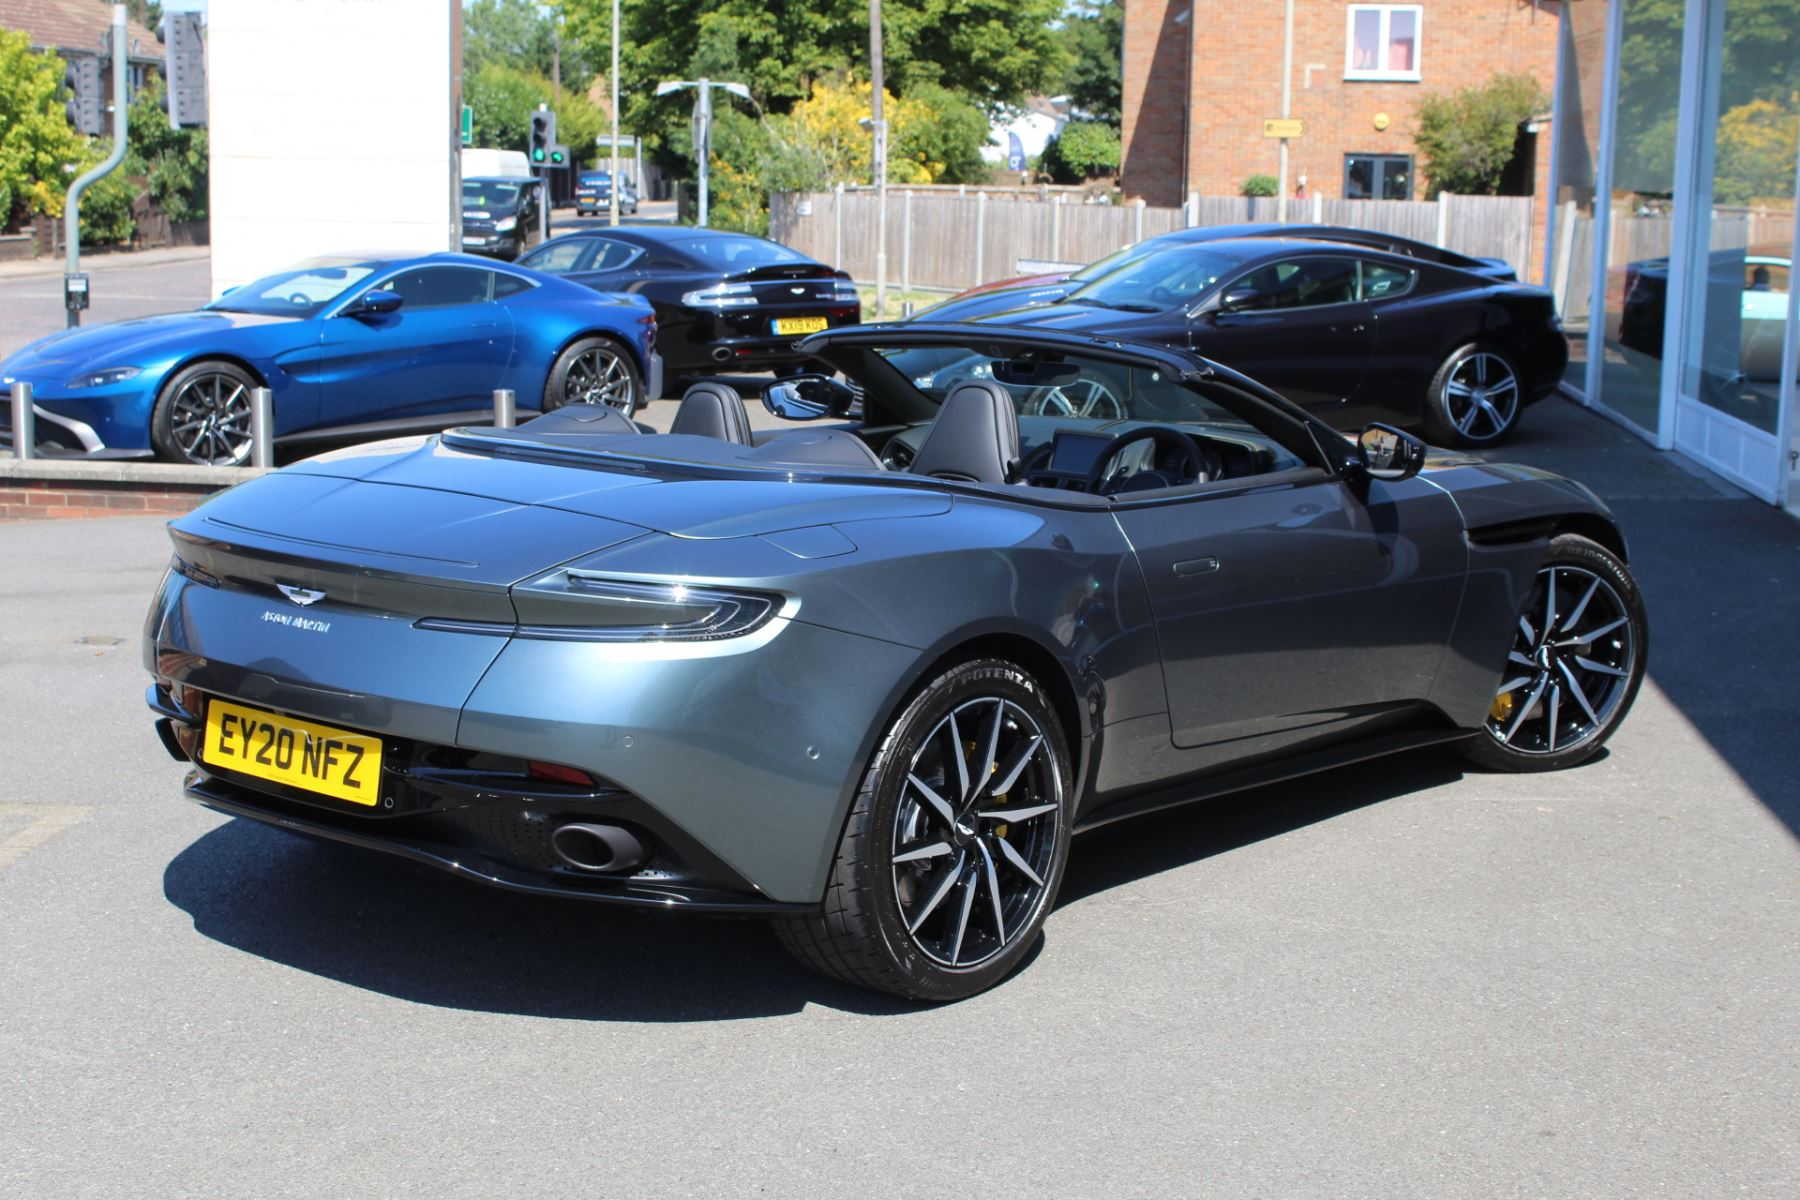 Aston Martin DB11 V8 Volante 2dr Touchtronic image 19